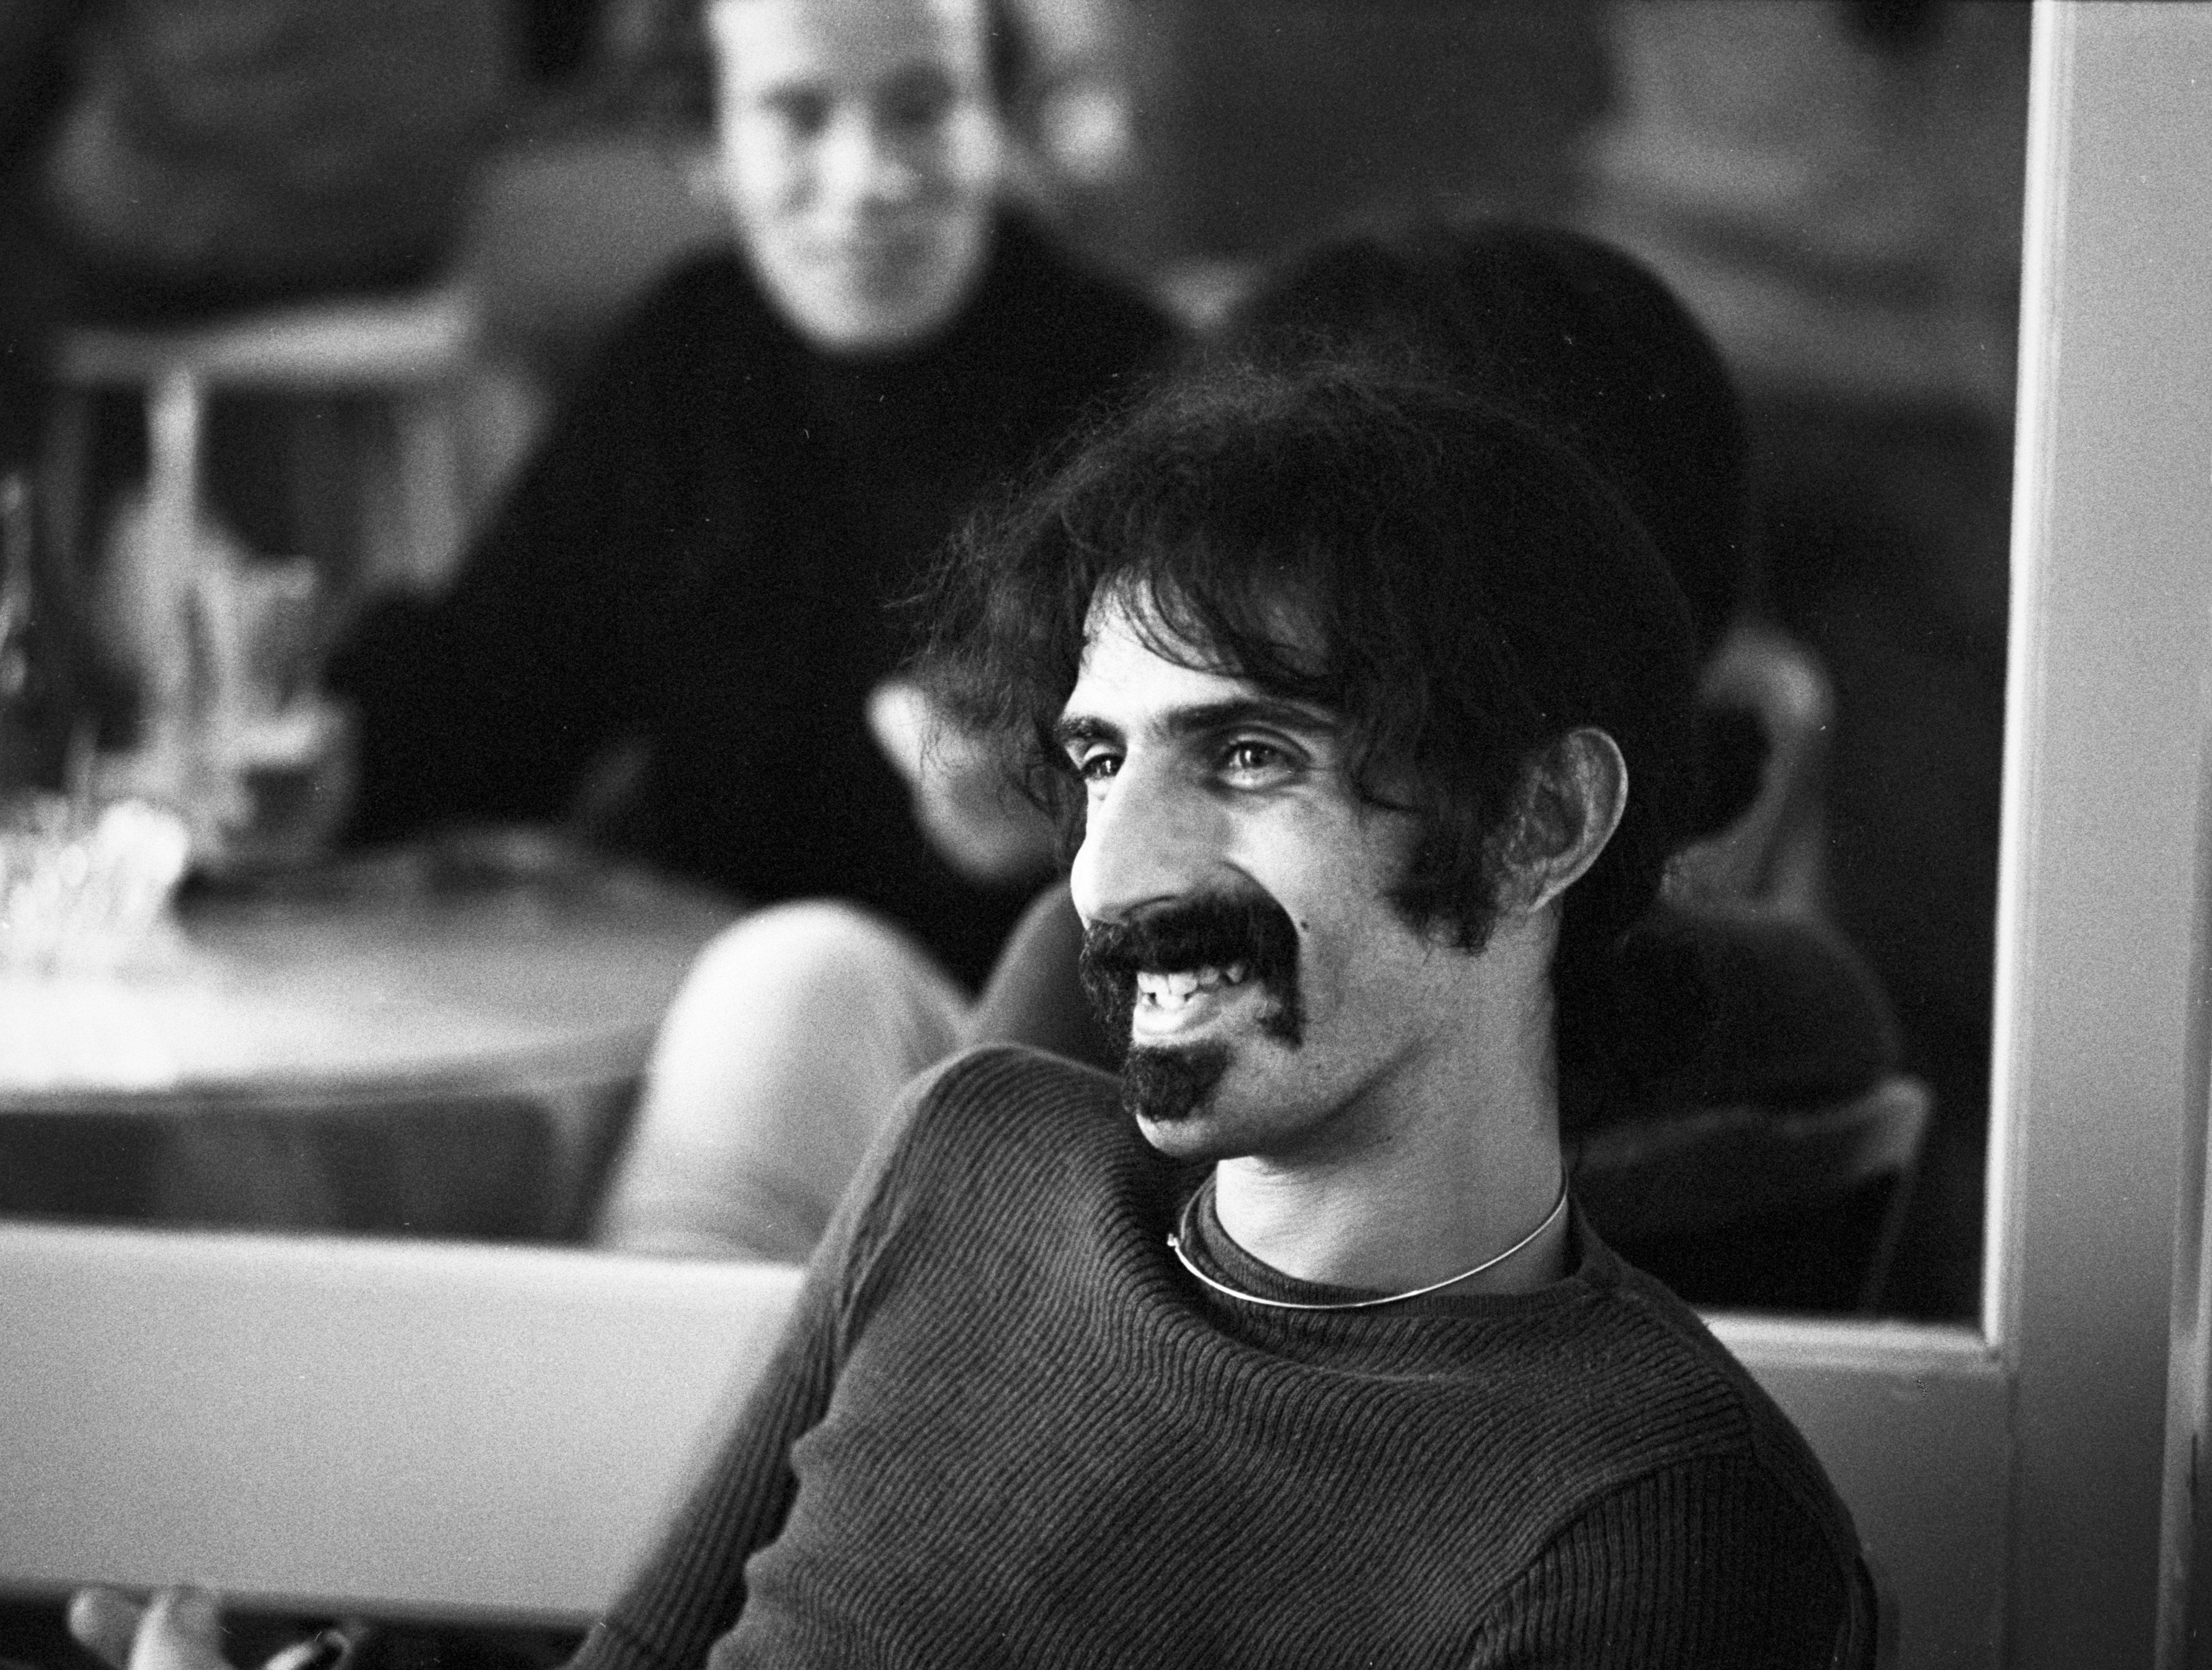 Frank Zappa S Family Plans Massive New Release Schedule